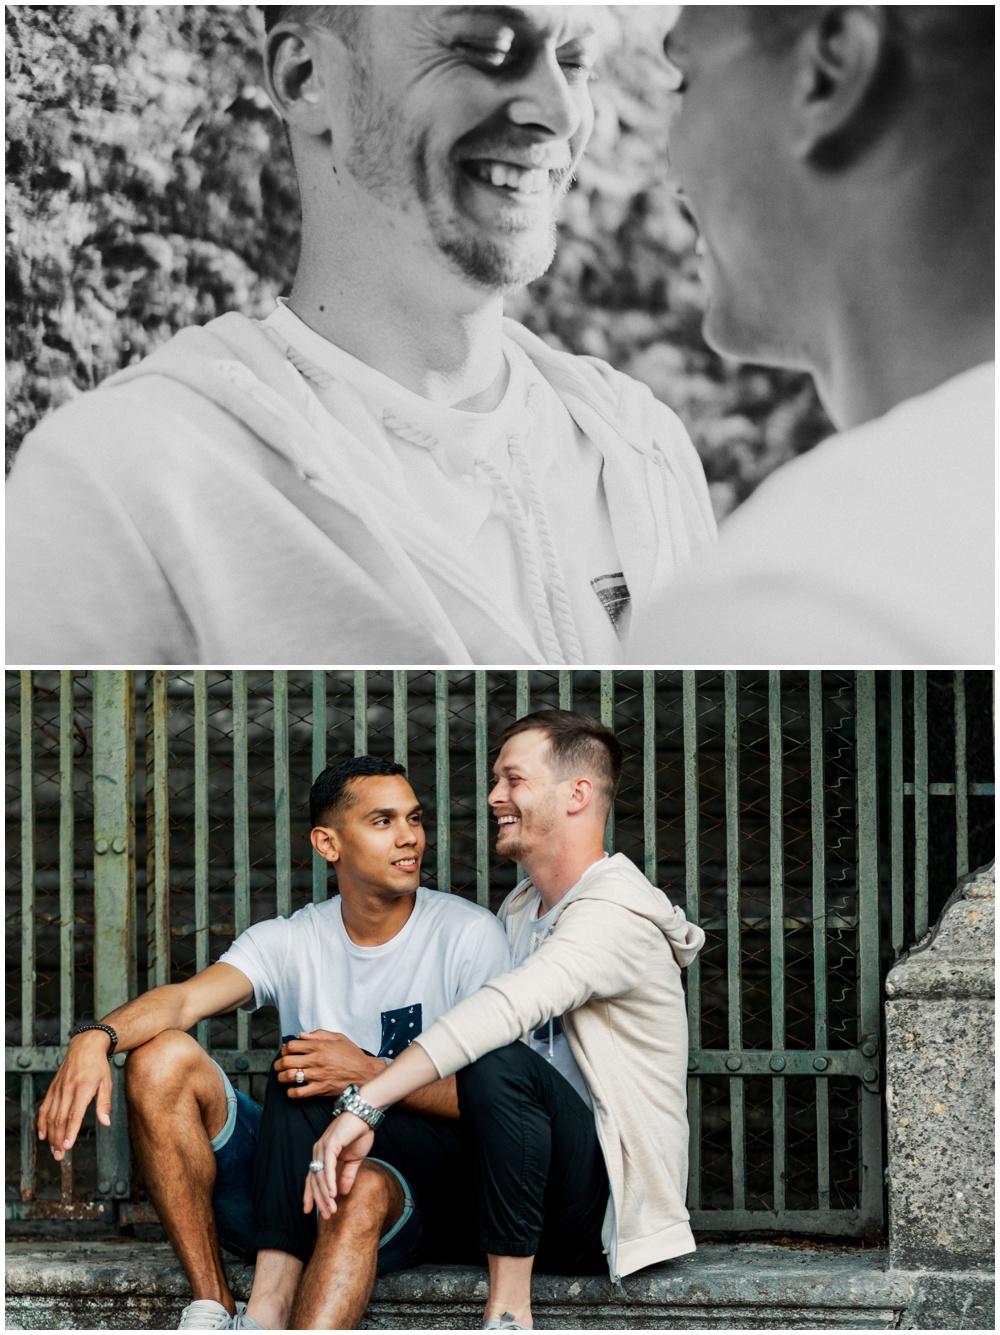 same-sex-wedding-photographer-venice-italy_0012.jpg